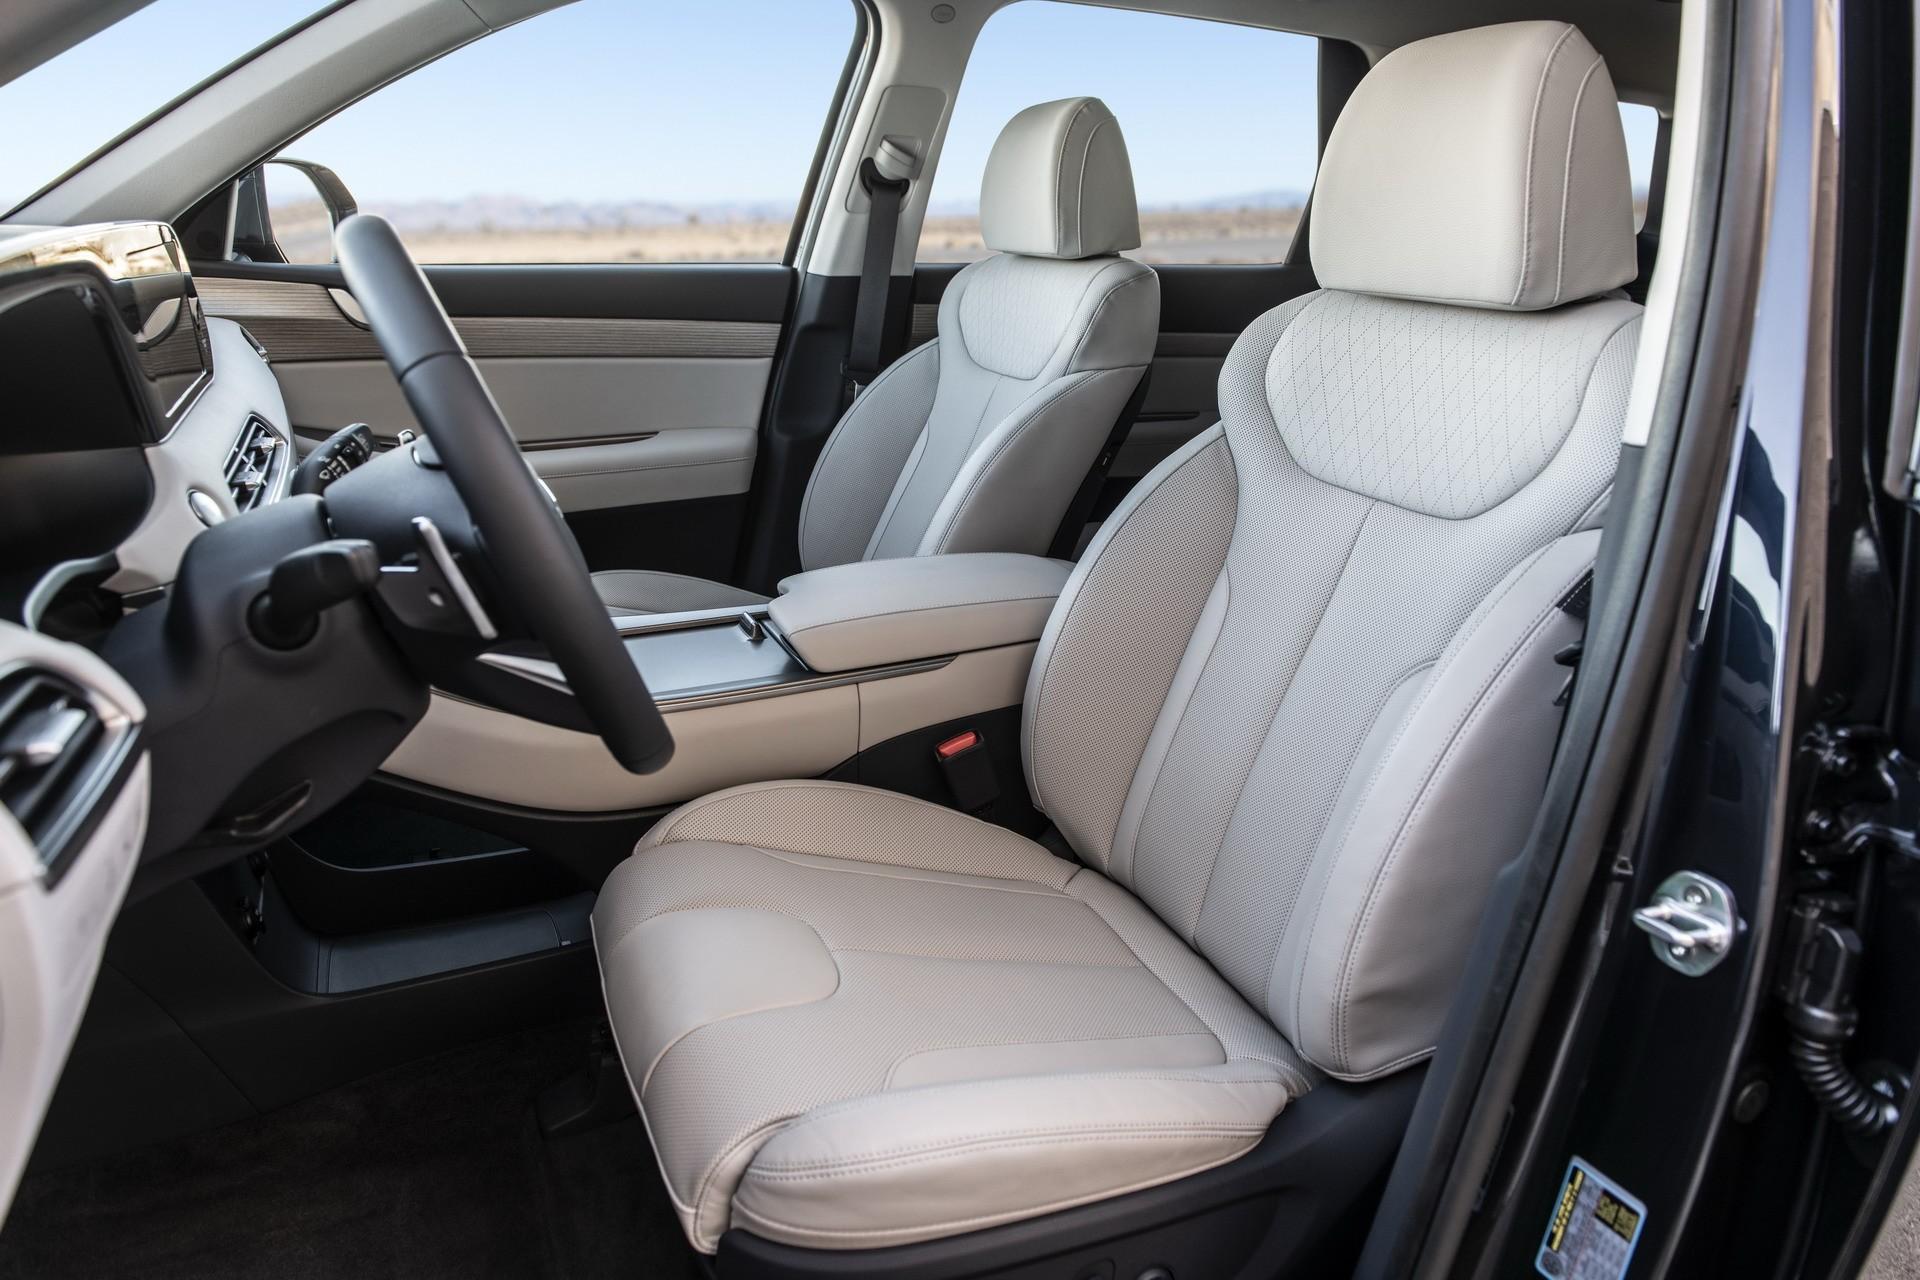 2020 Hyundai Palisade Oozes 8-Seat Crossover Luxury - autoevolution